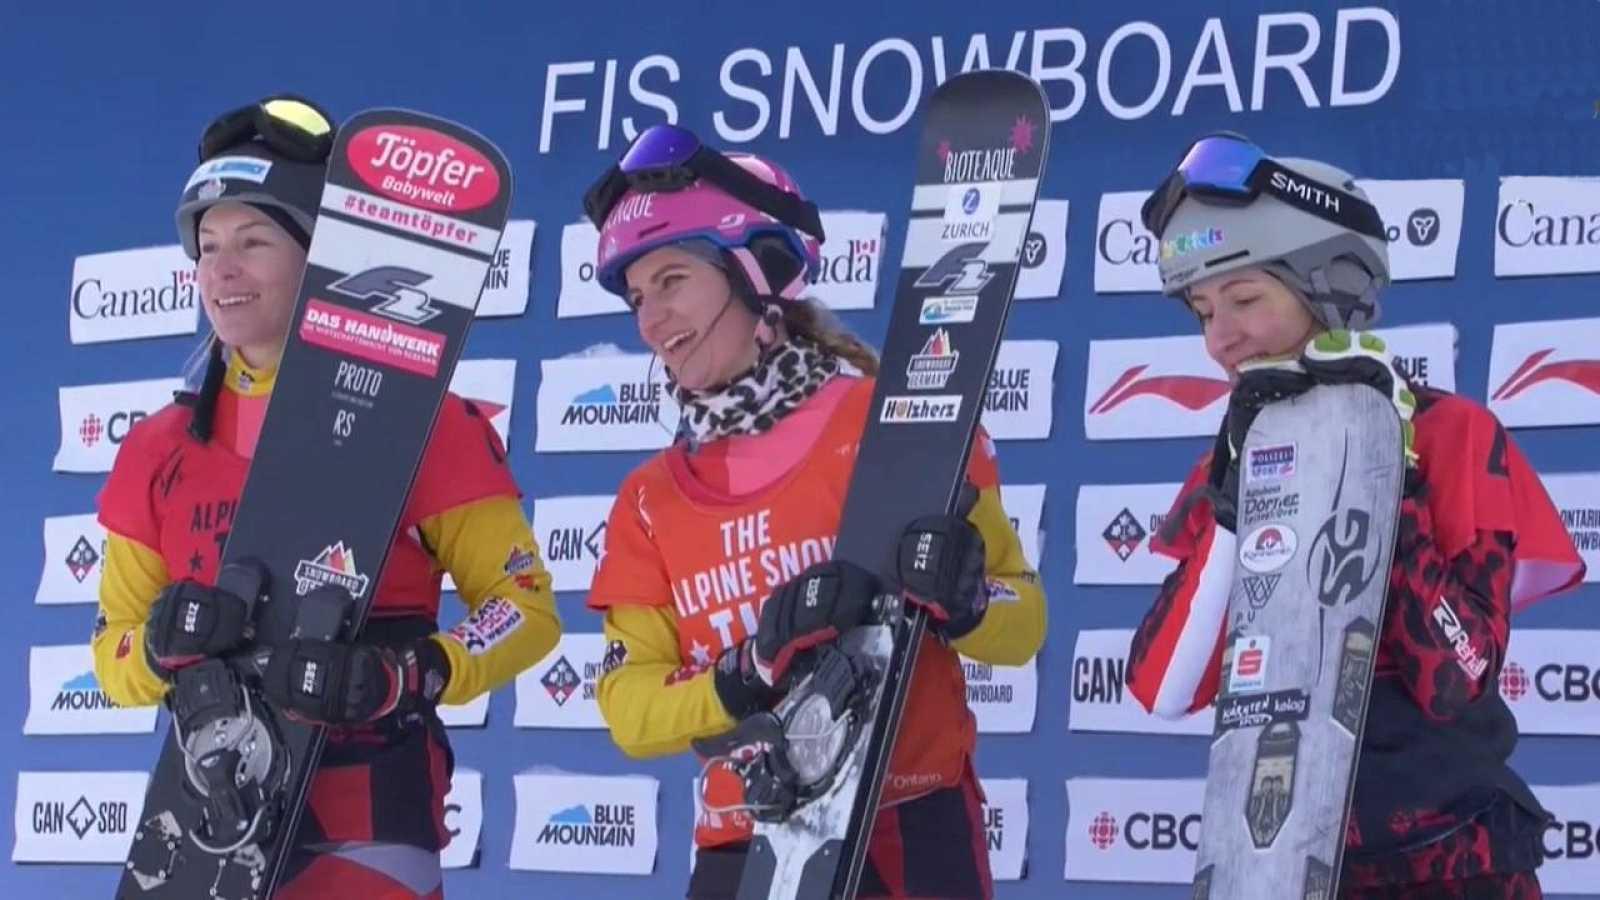 Snowboard - FIS Snowboard. Copa del Mundo. Magazine - Programa 11 - ver ahora